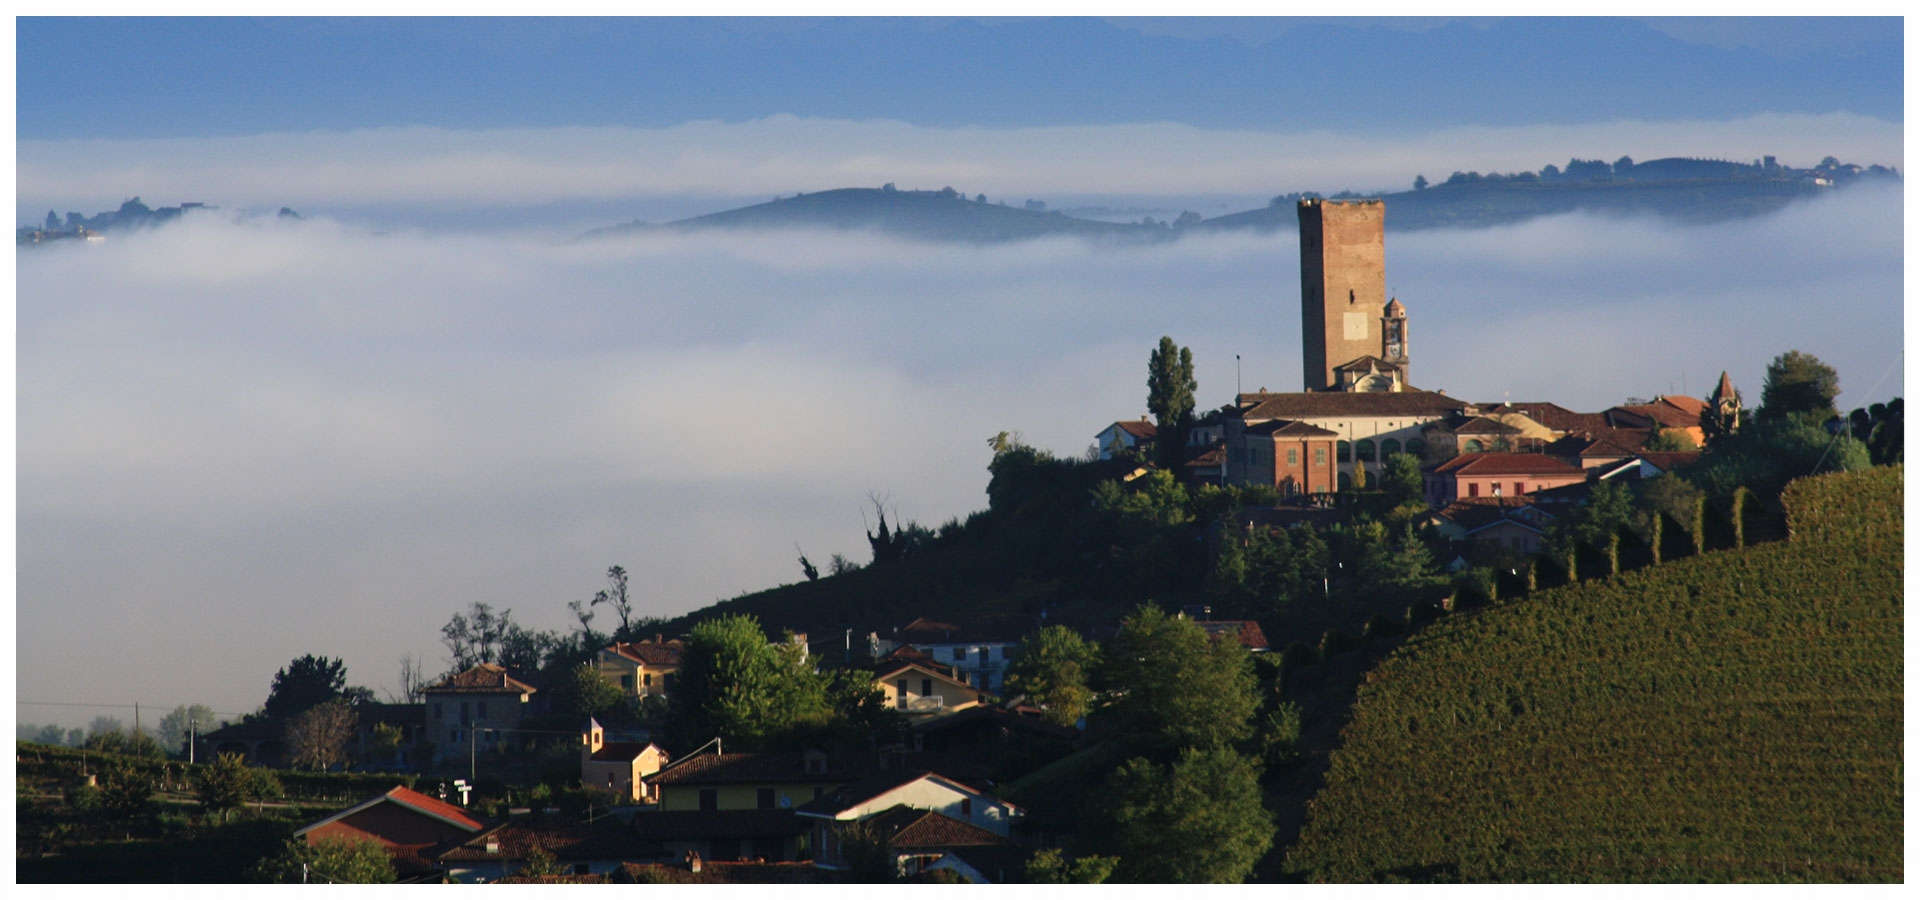 Torre-di-barbaresco-4.jpg